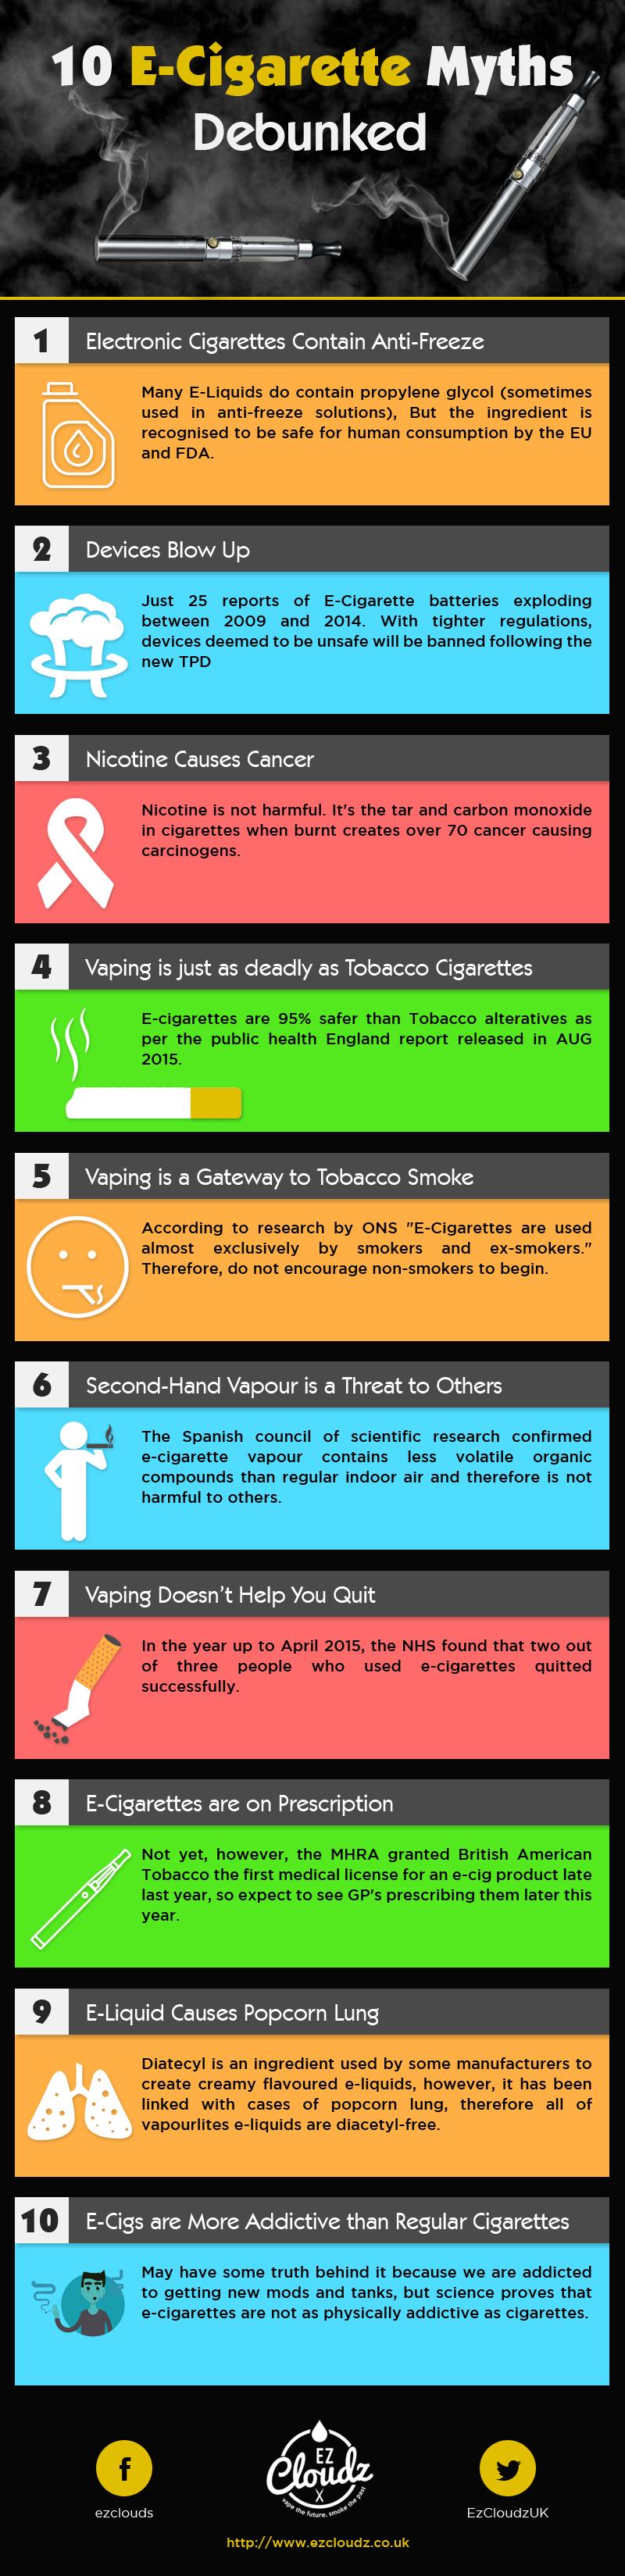 10-e-cigarette-myths-debunked